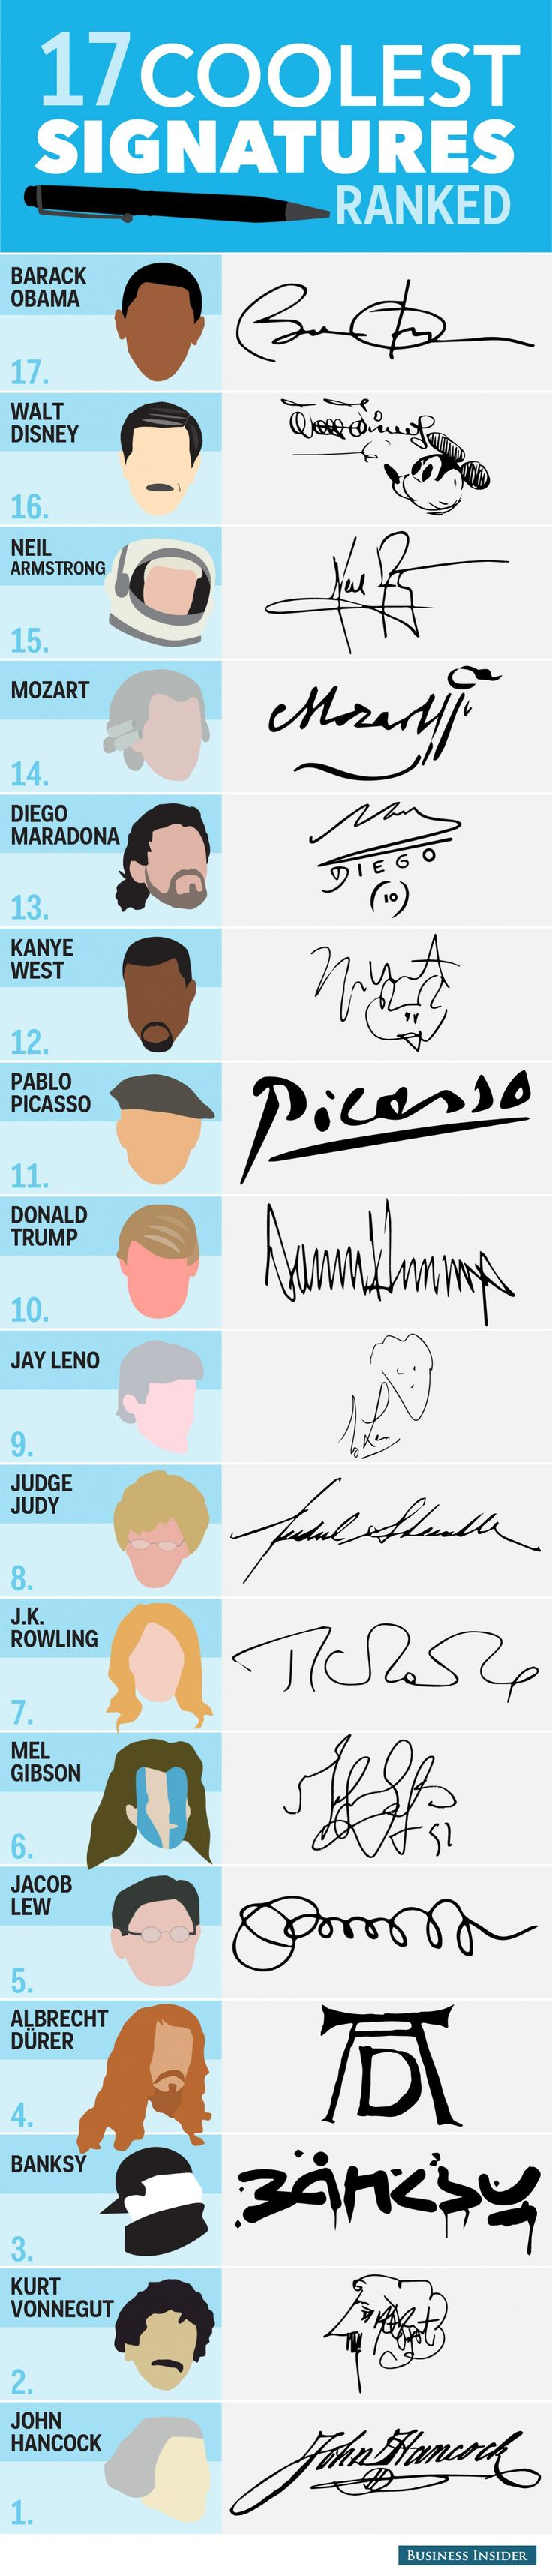 assinatura de gente famosa (: